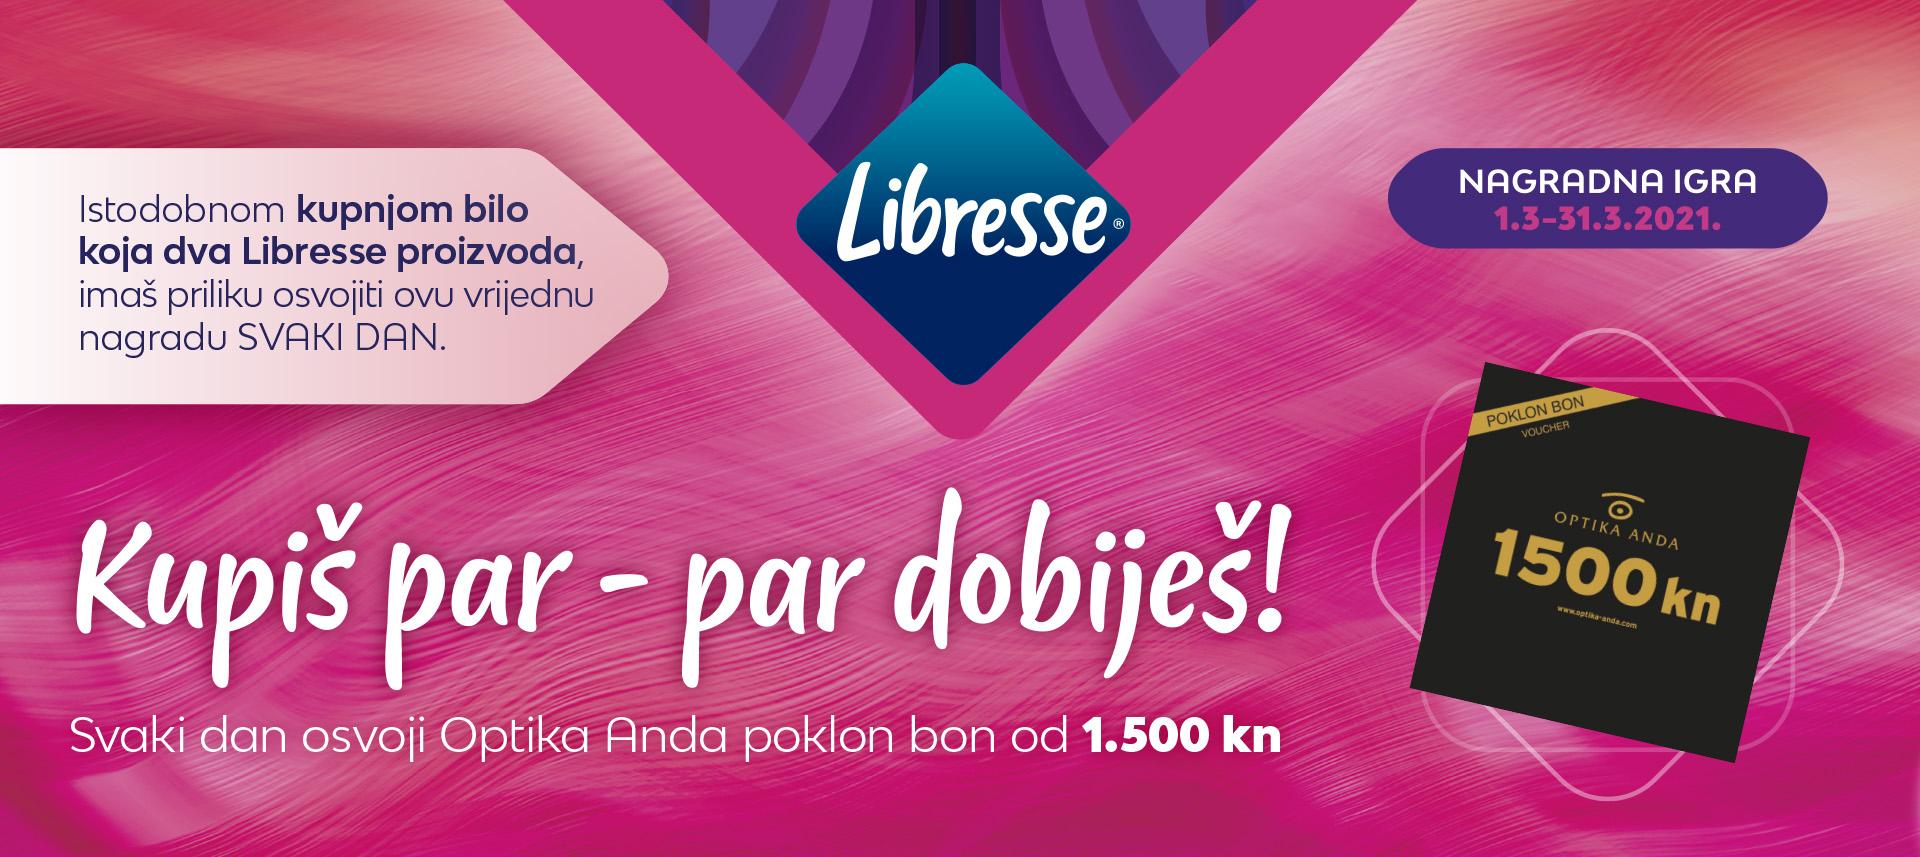 Libresse 2021 NI Konzum banner 1920x857 v1.0.jpg